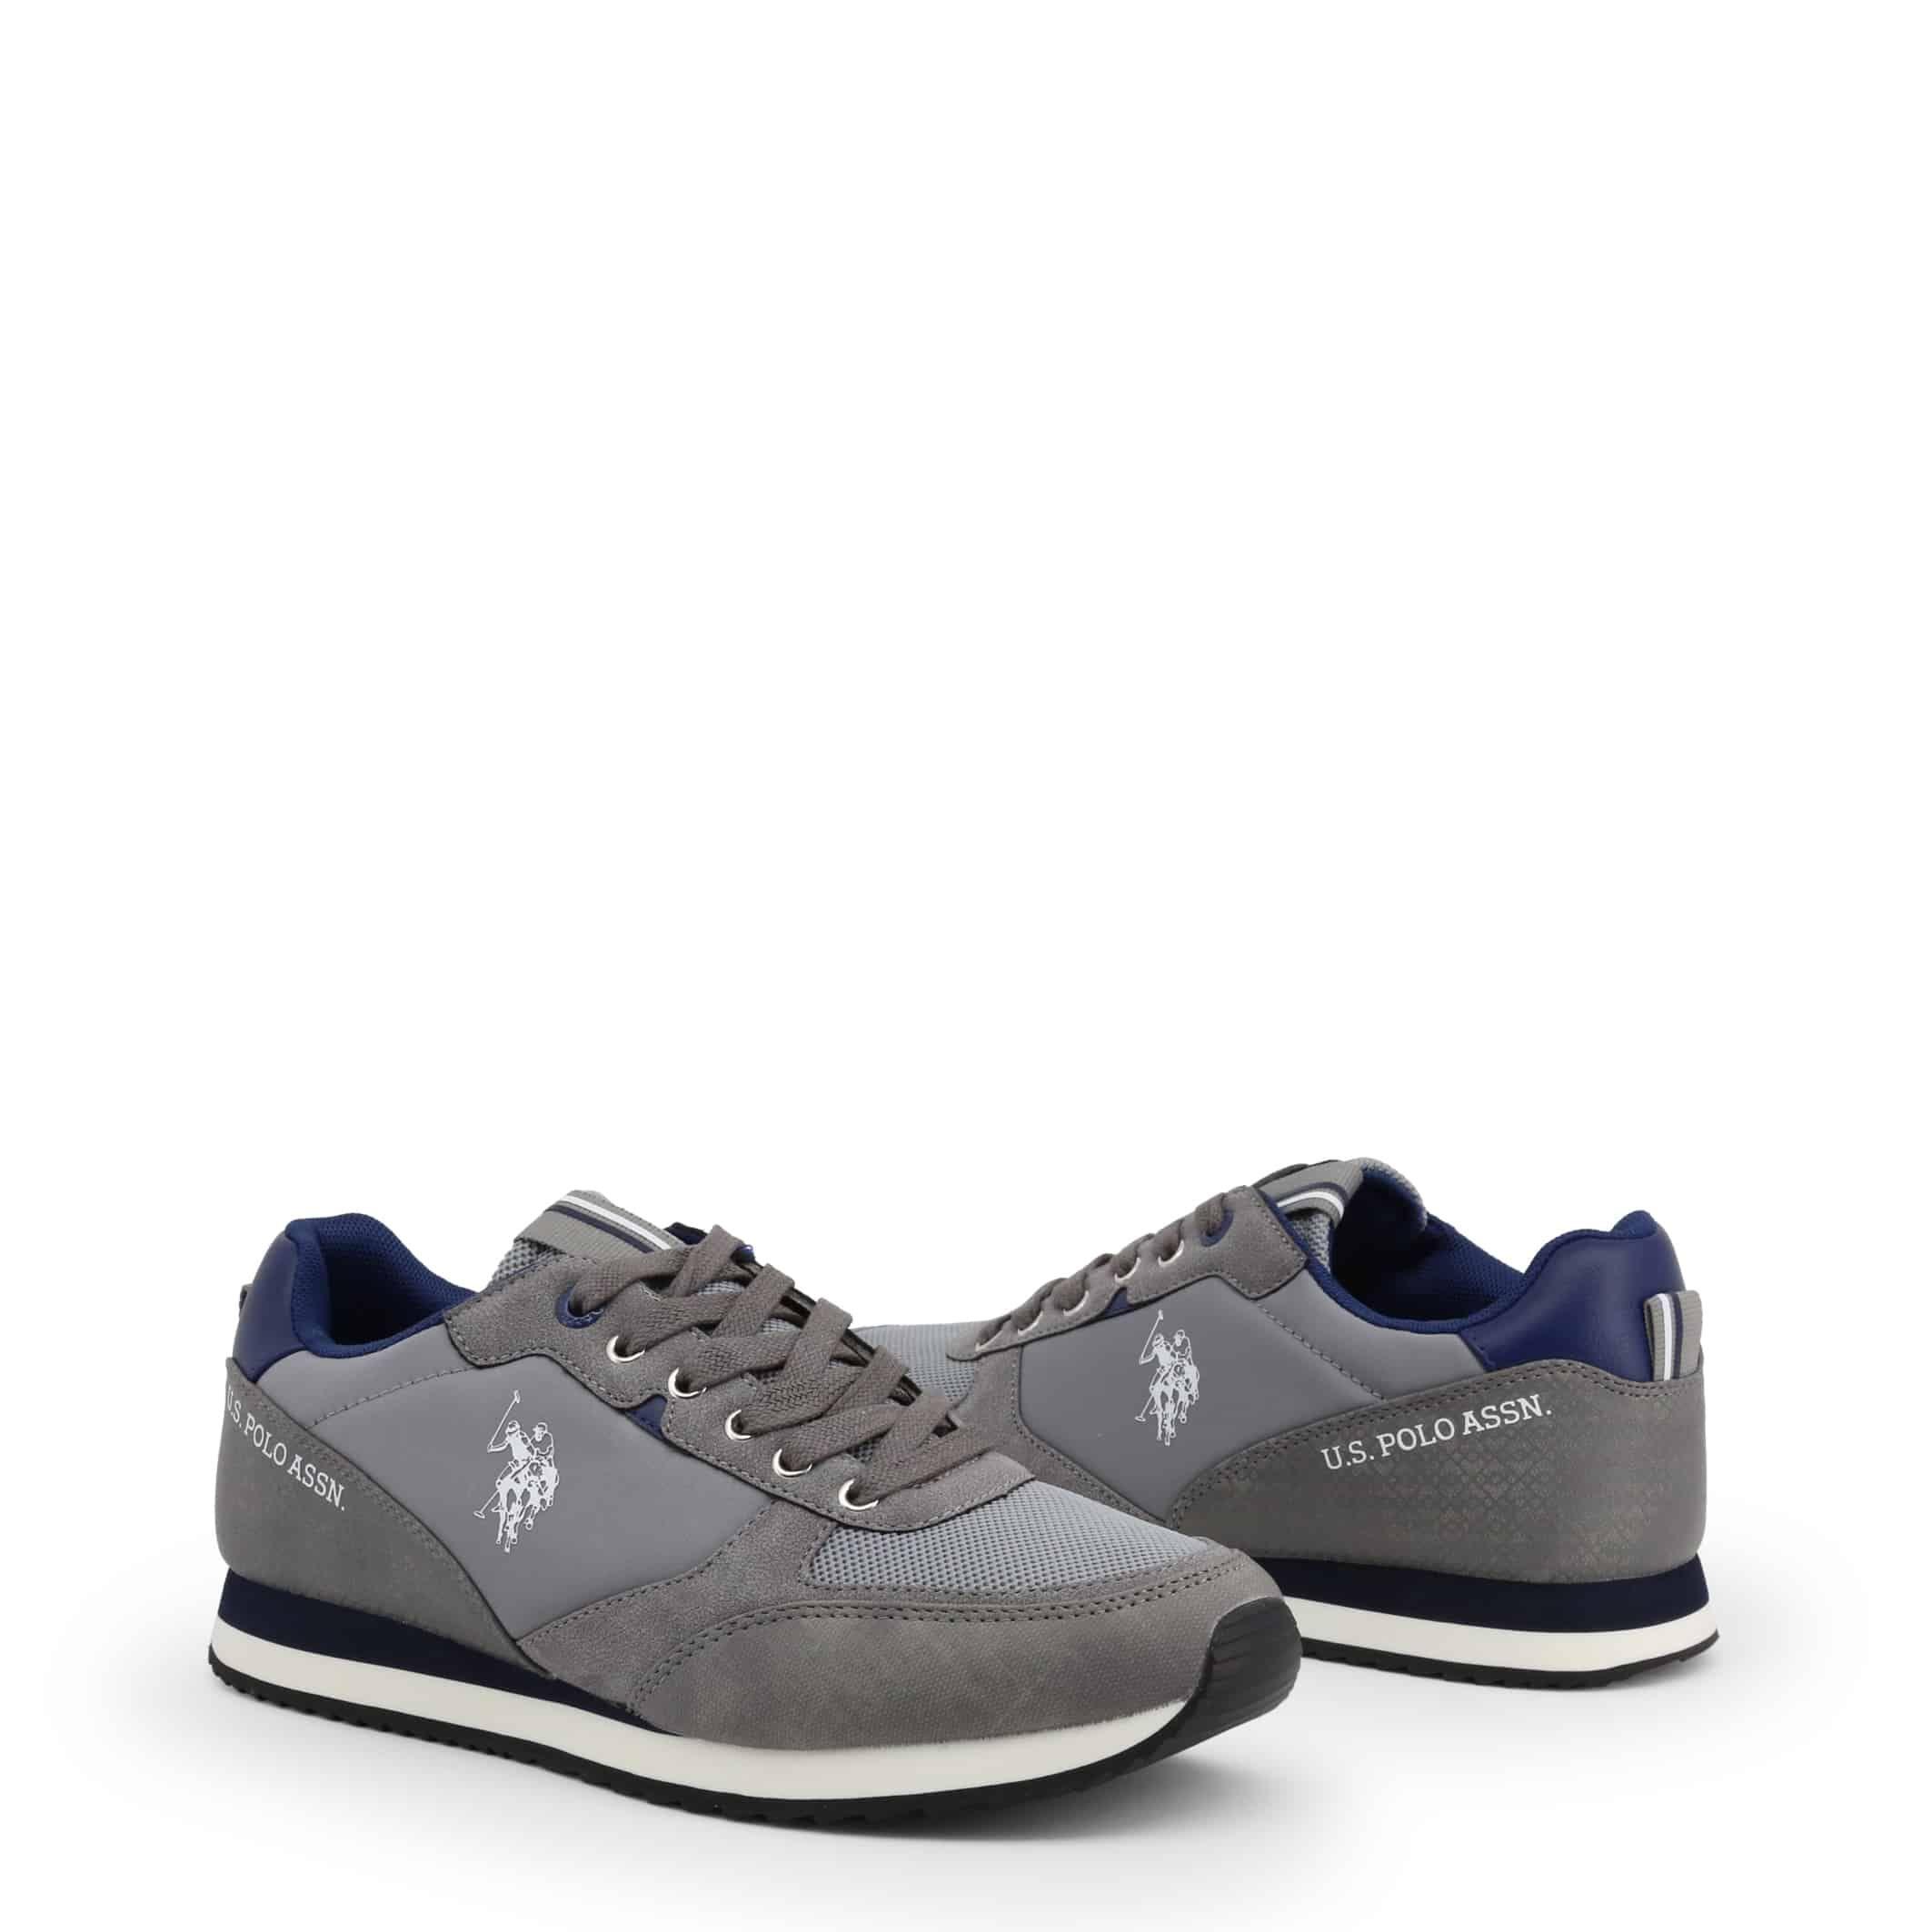 Schuhe U.S. Polo Assn. – WILYS4123S0_YH1 – Grau